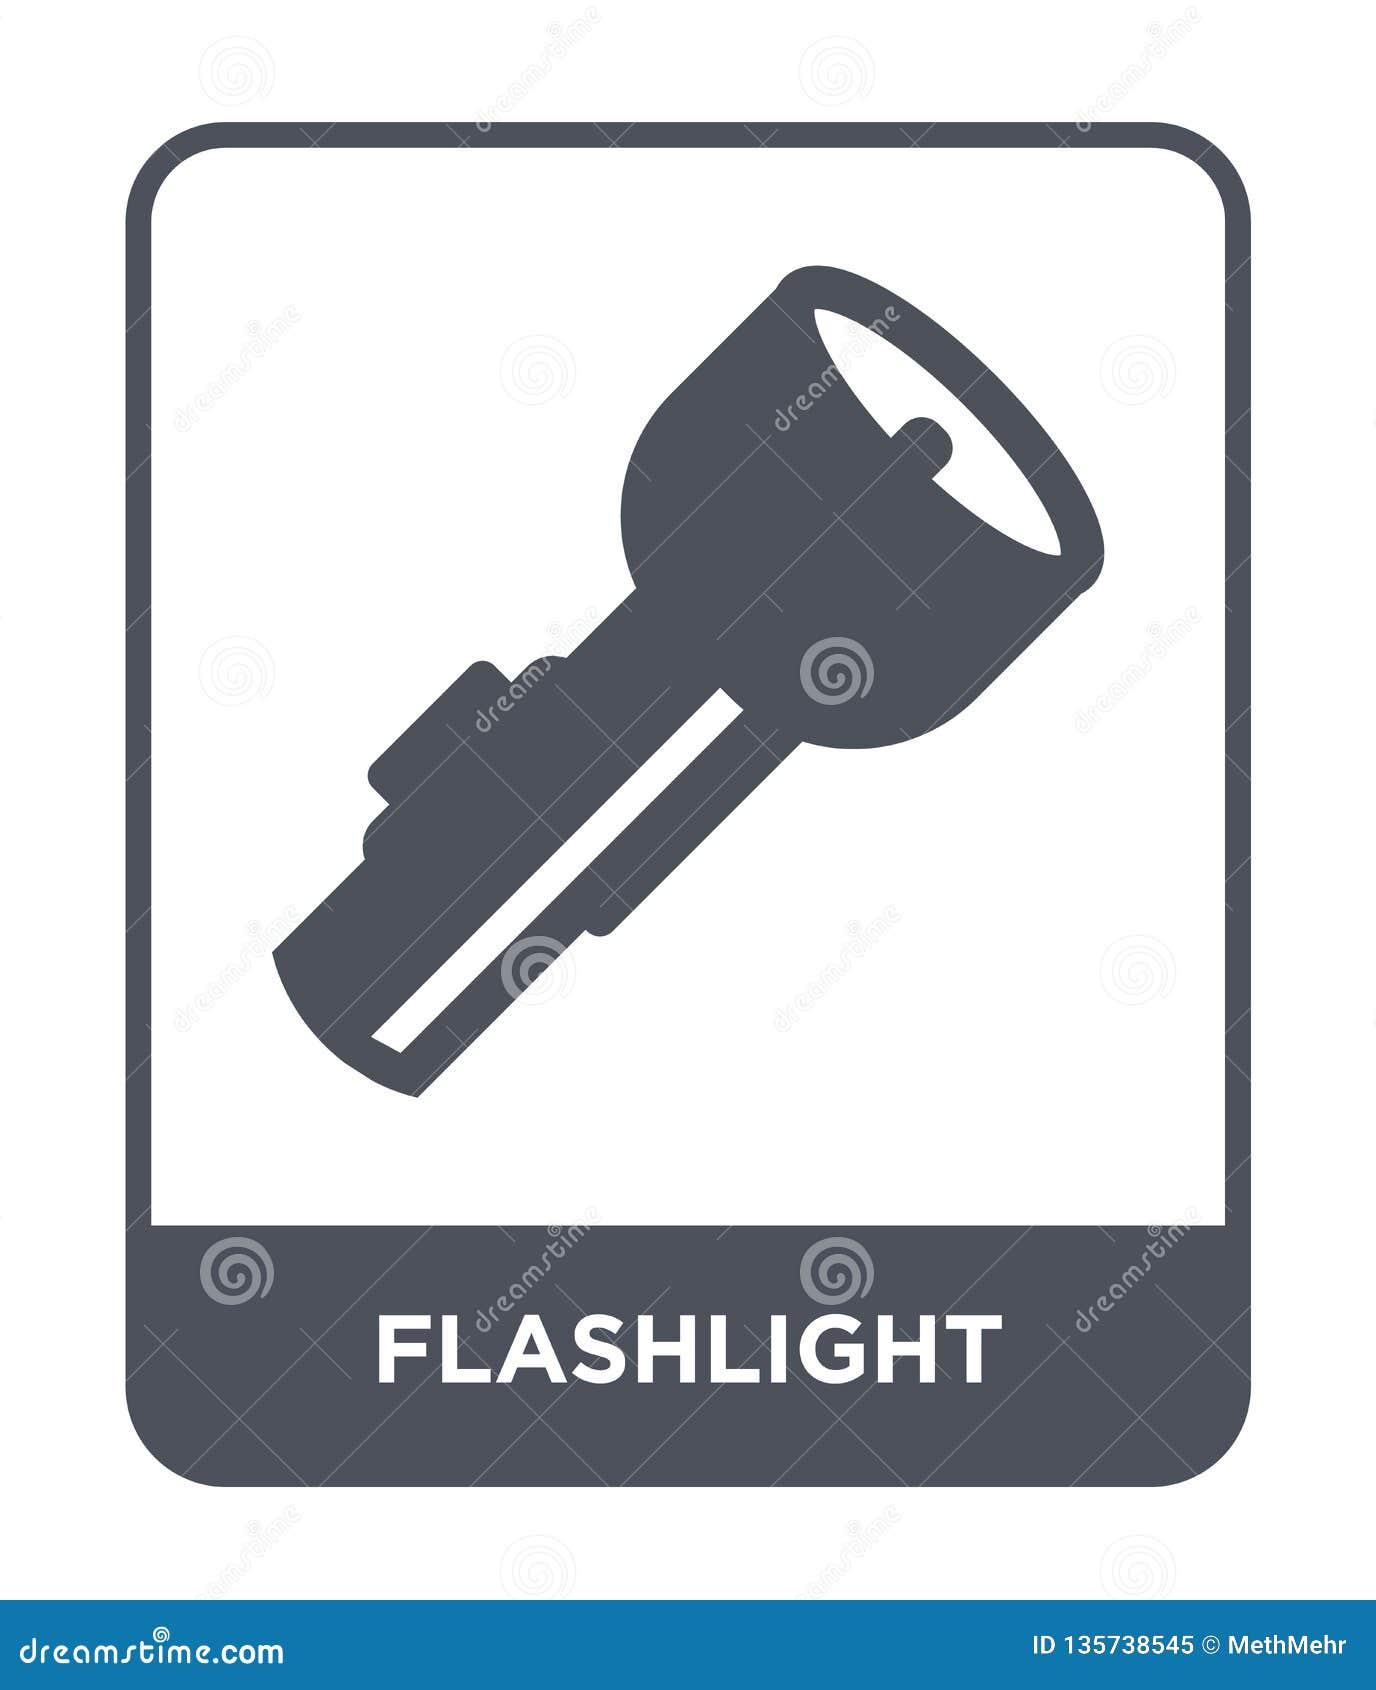 ícone da lanterna elétrica no estilo na moda do projeto Ícone da lanterna elétrica isolado no fundo branco ícone do vetor da lant